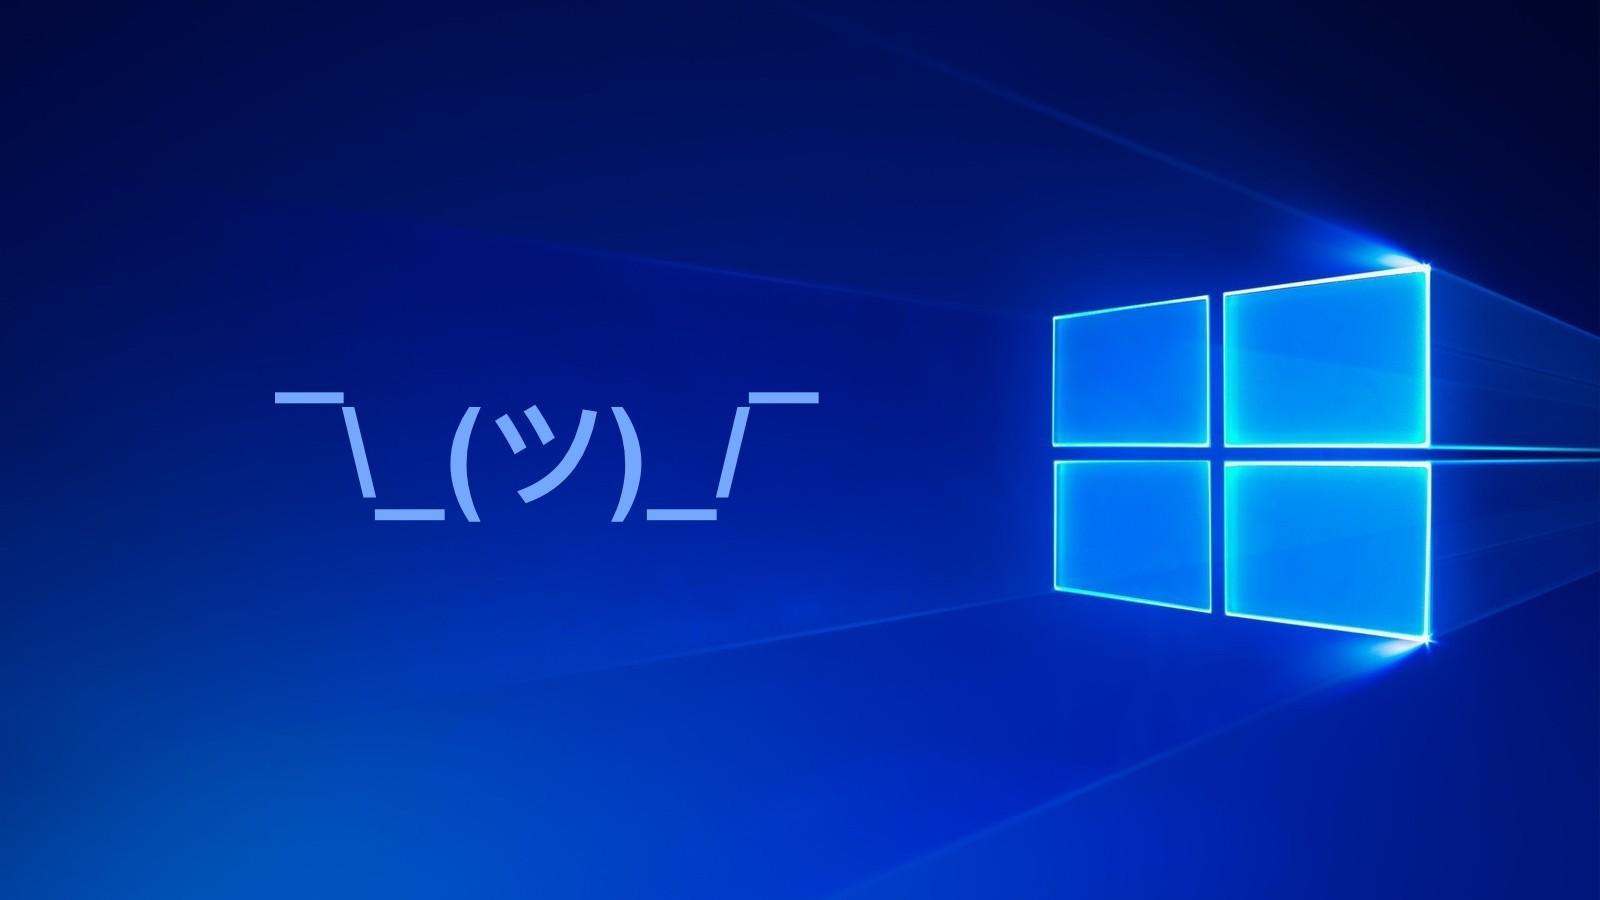 Windows update causes BSOD